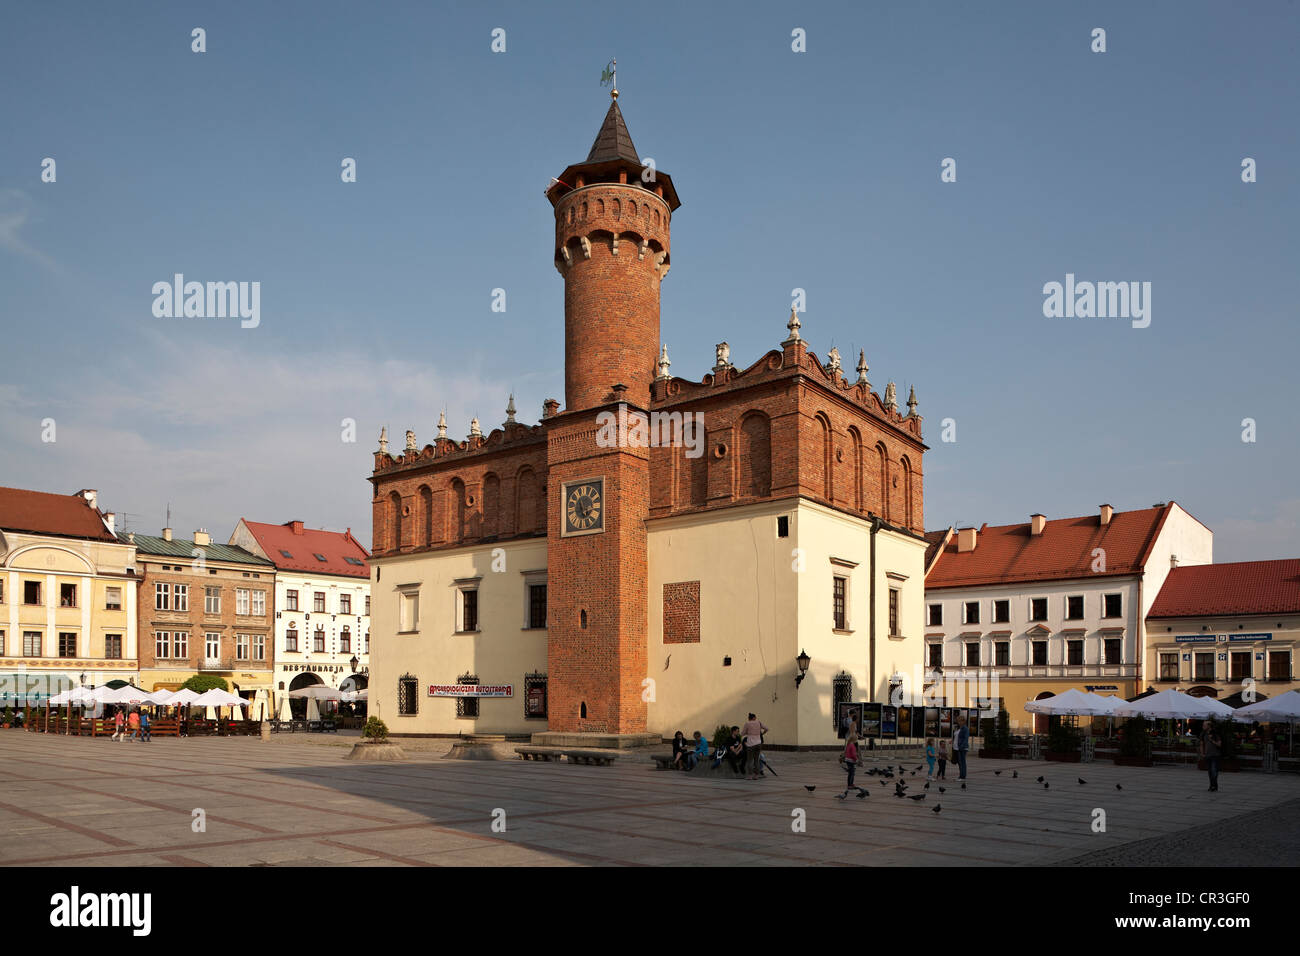 Eastern Europe Poland Tarnow Rynek Main Square 15th-century Town Hall - Stock Image